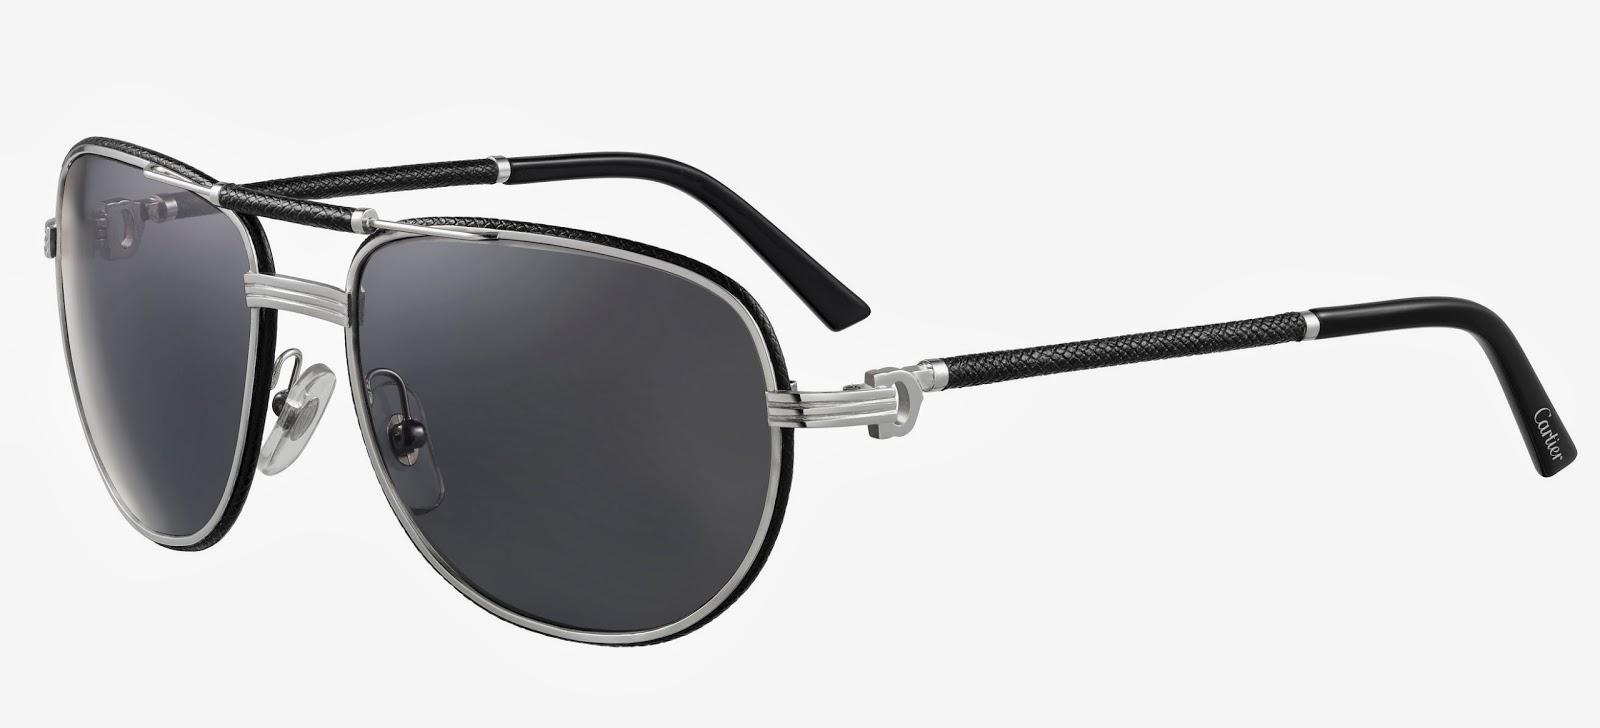 cebf50b6e3 The additional contemporary aviator sunglasses in metal and black leather  jpg 1600x728 Cartier sunglasses 2013